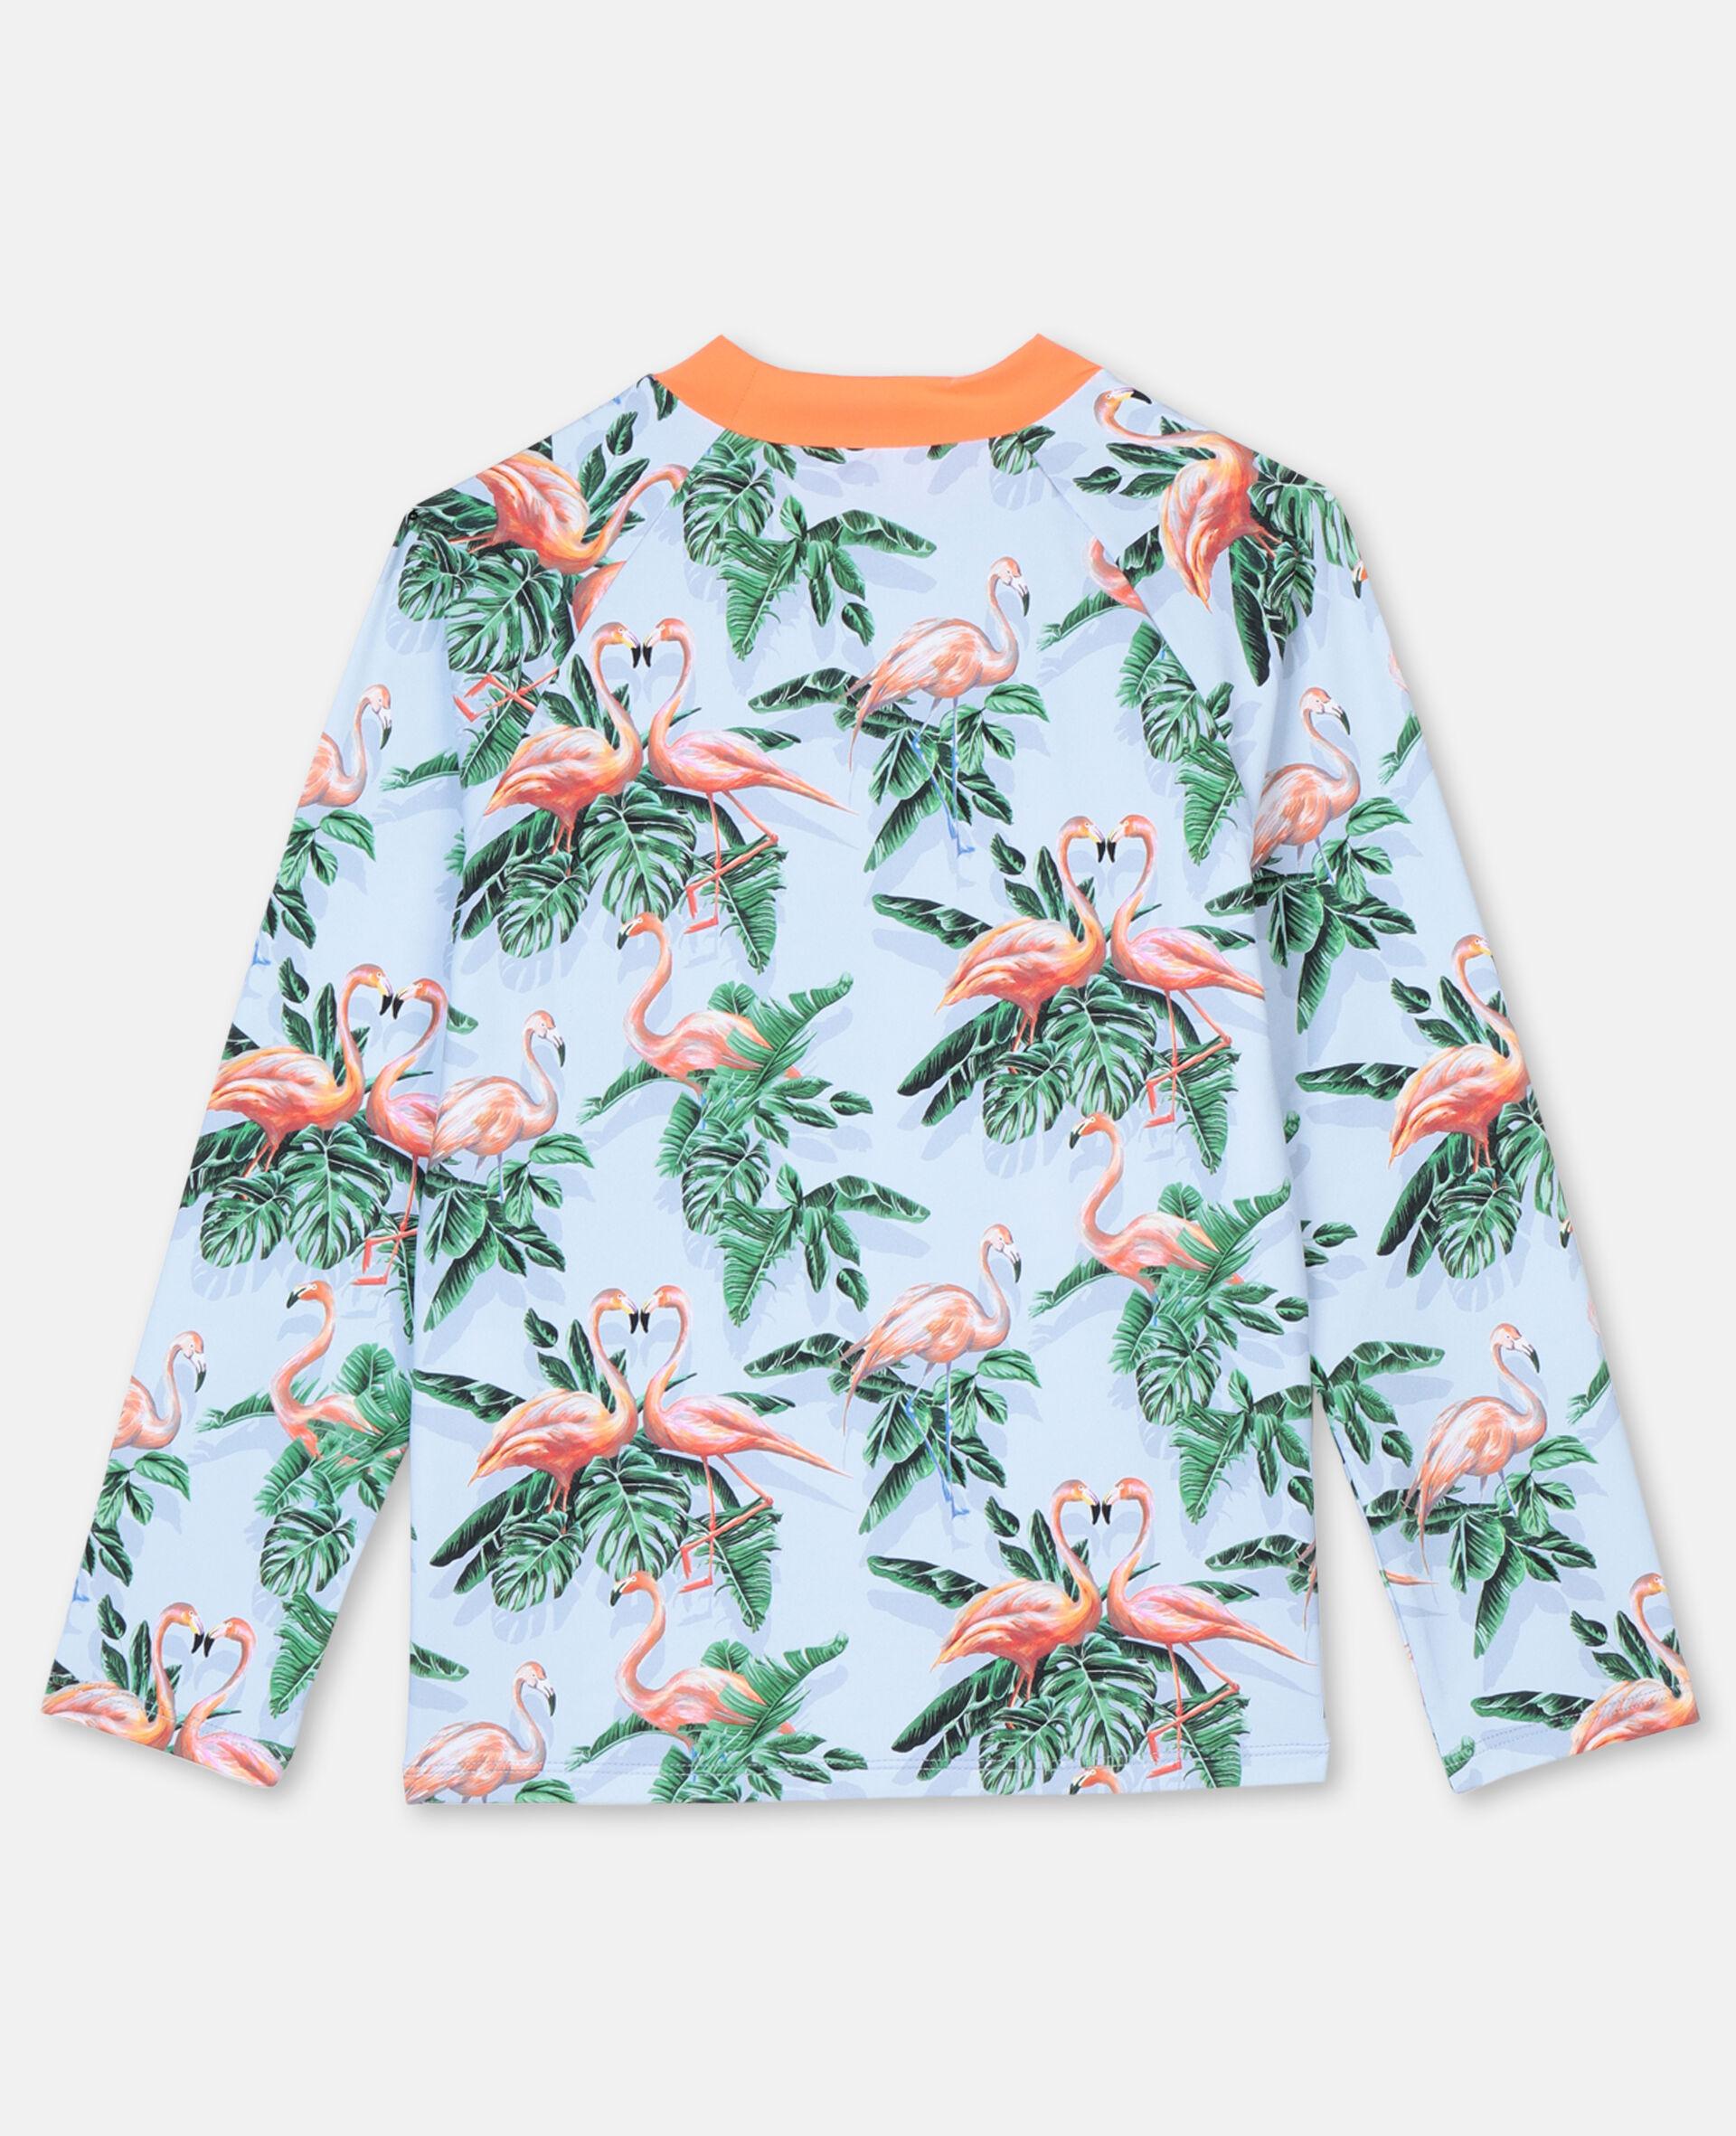 Painty Flamingo游泳T恤 -绿色-large image number 4